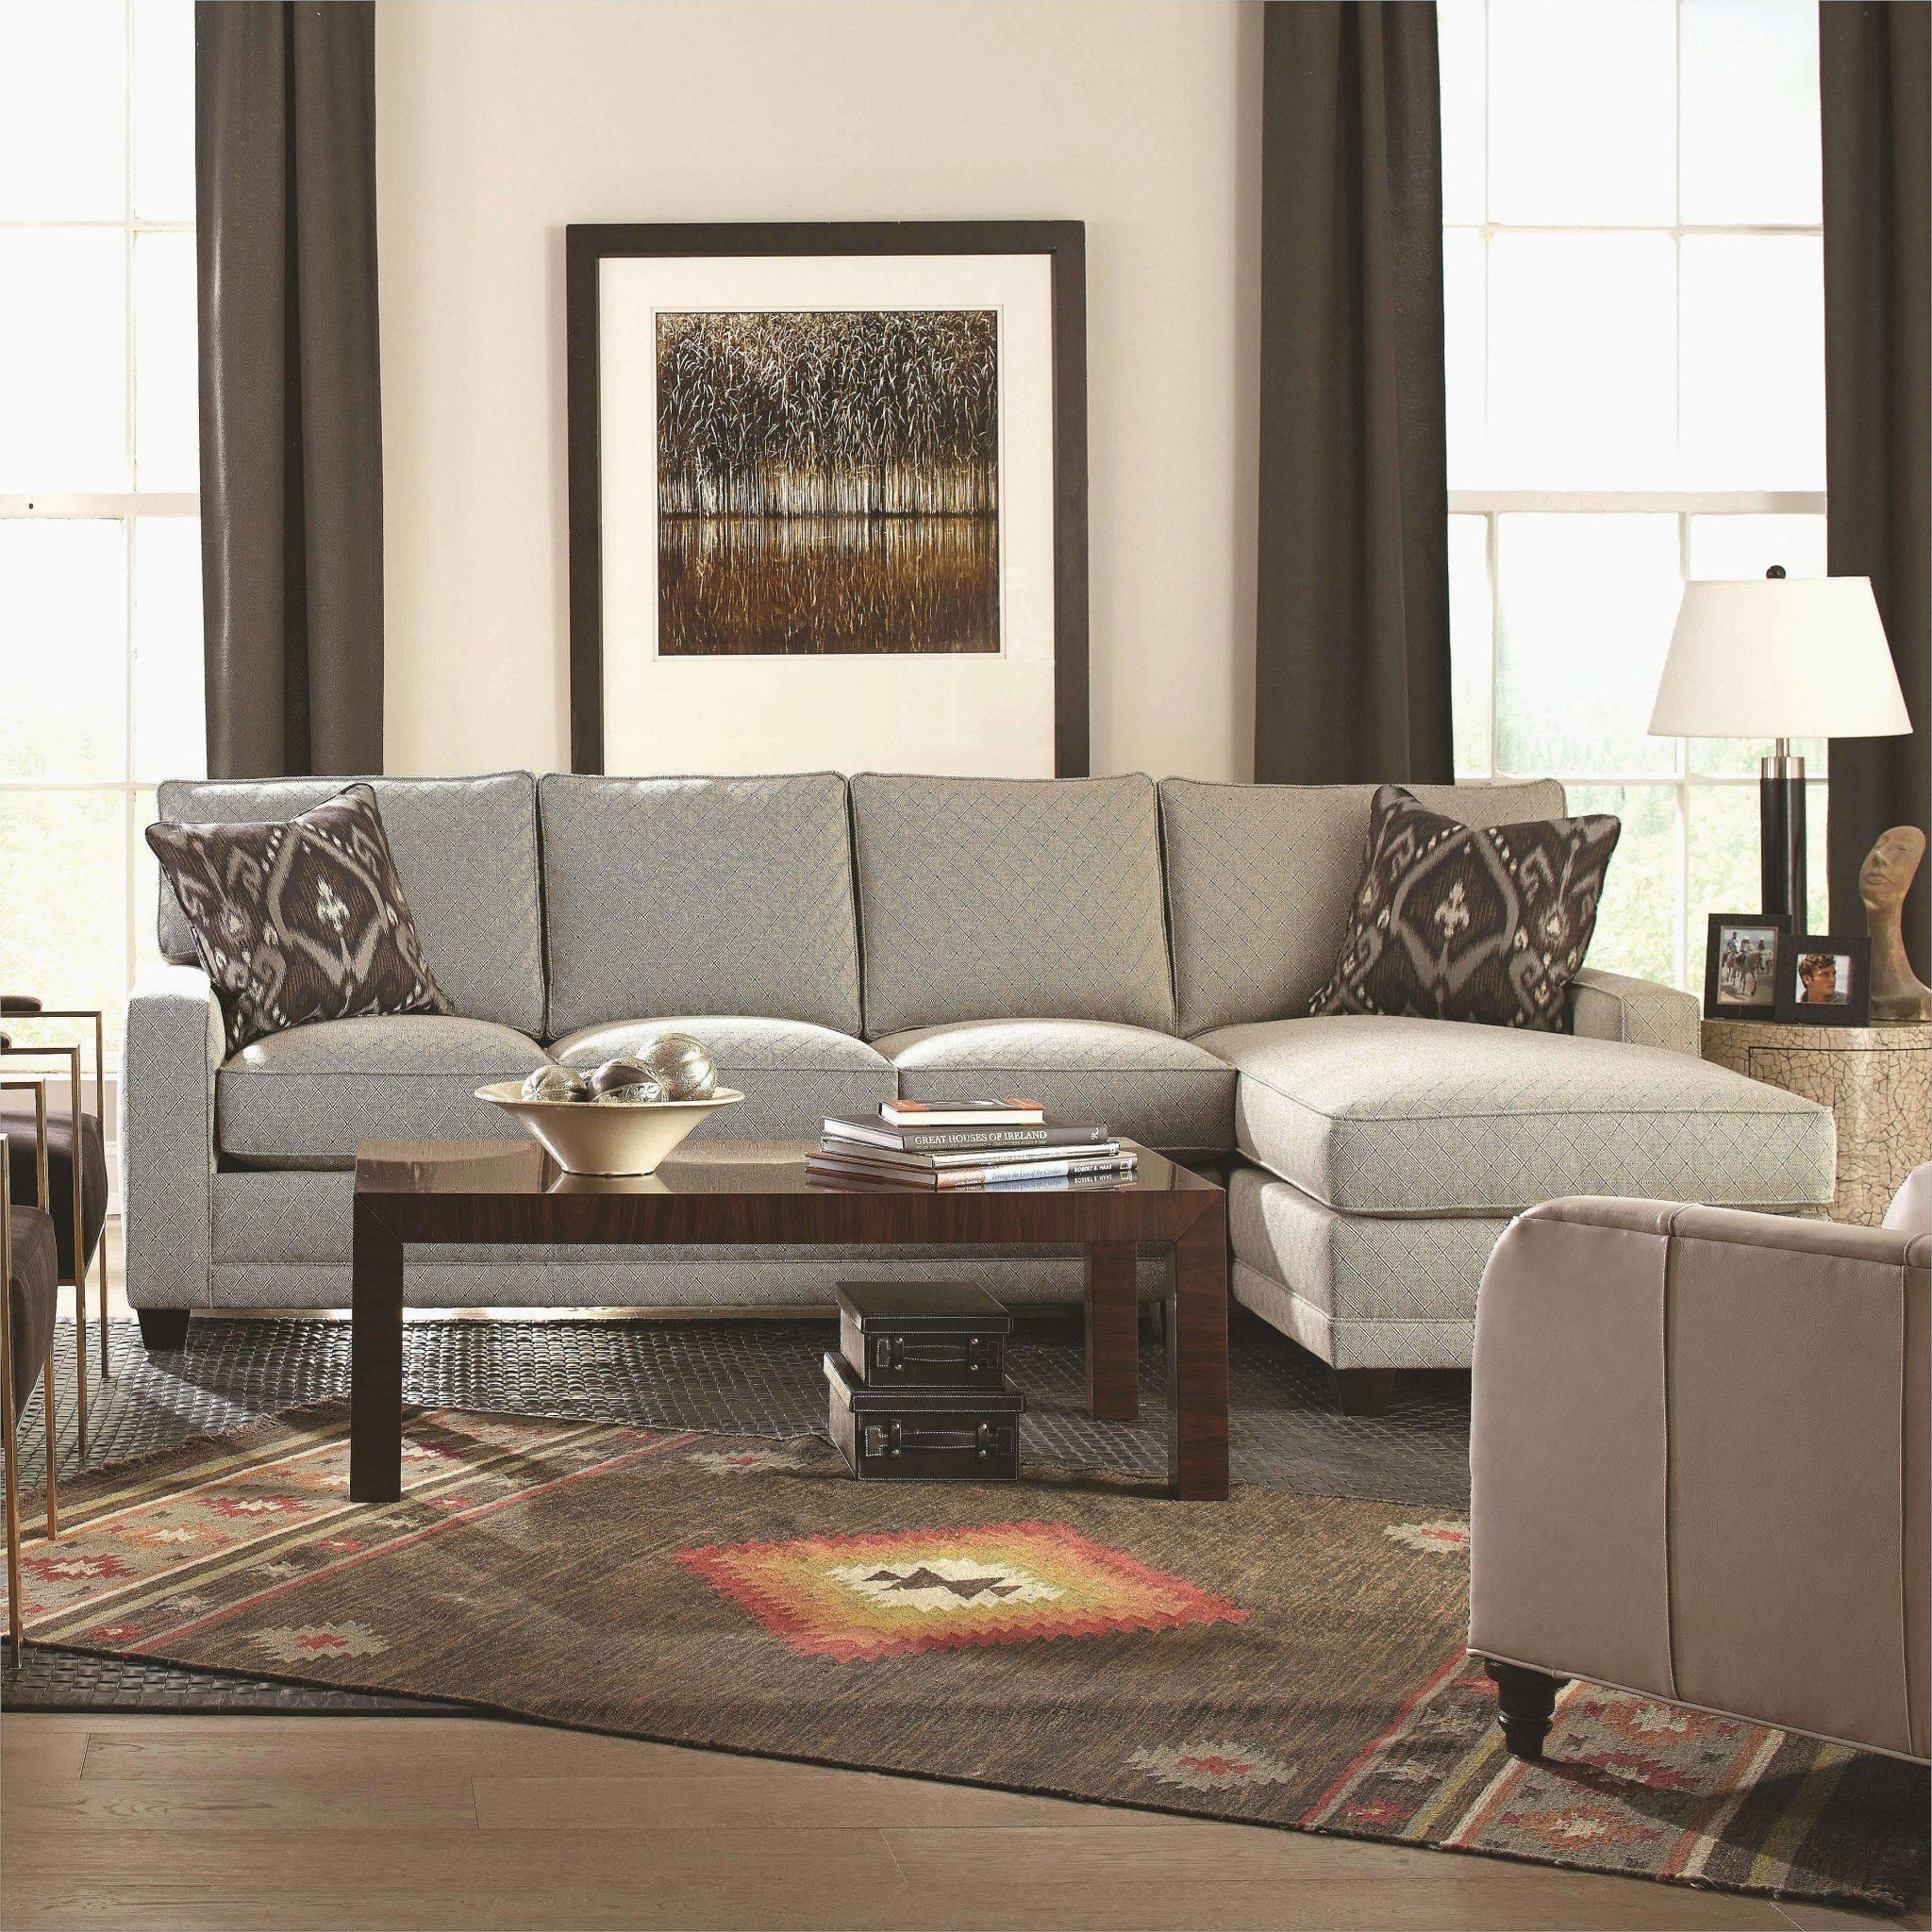 modern home interior design gallery home decor living room lovely modern living room furniture new of modern home interior design gallery